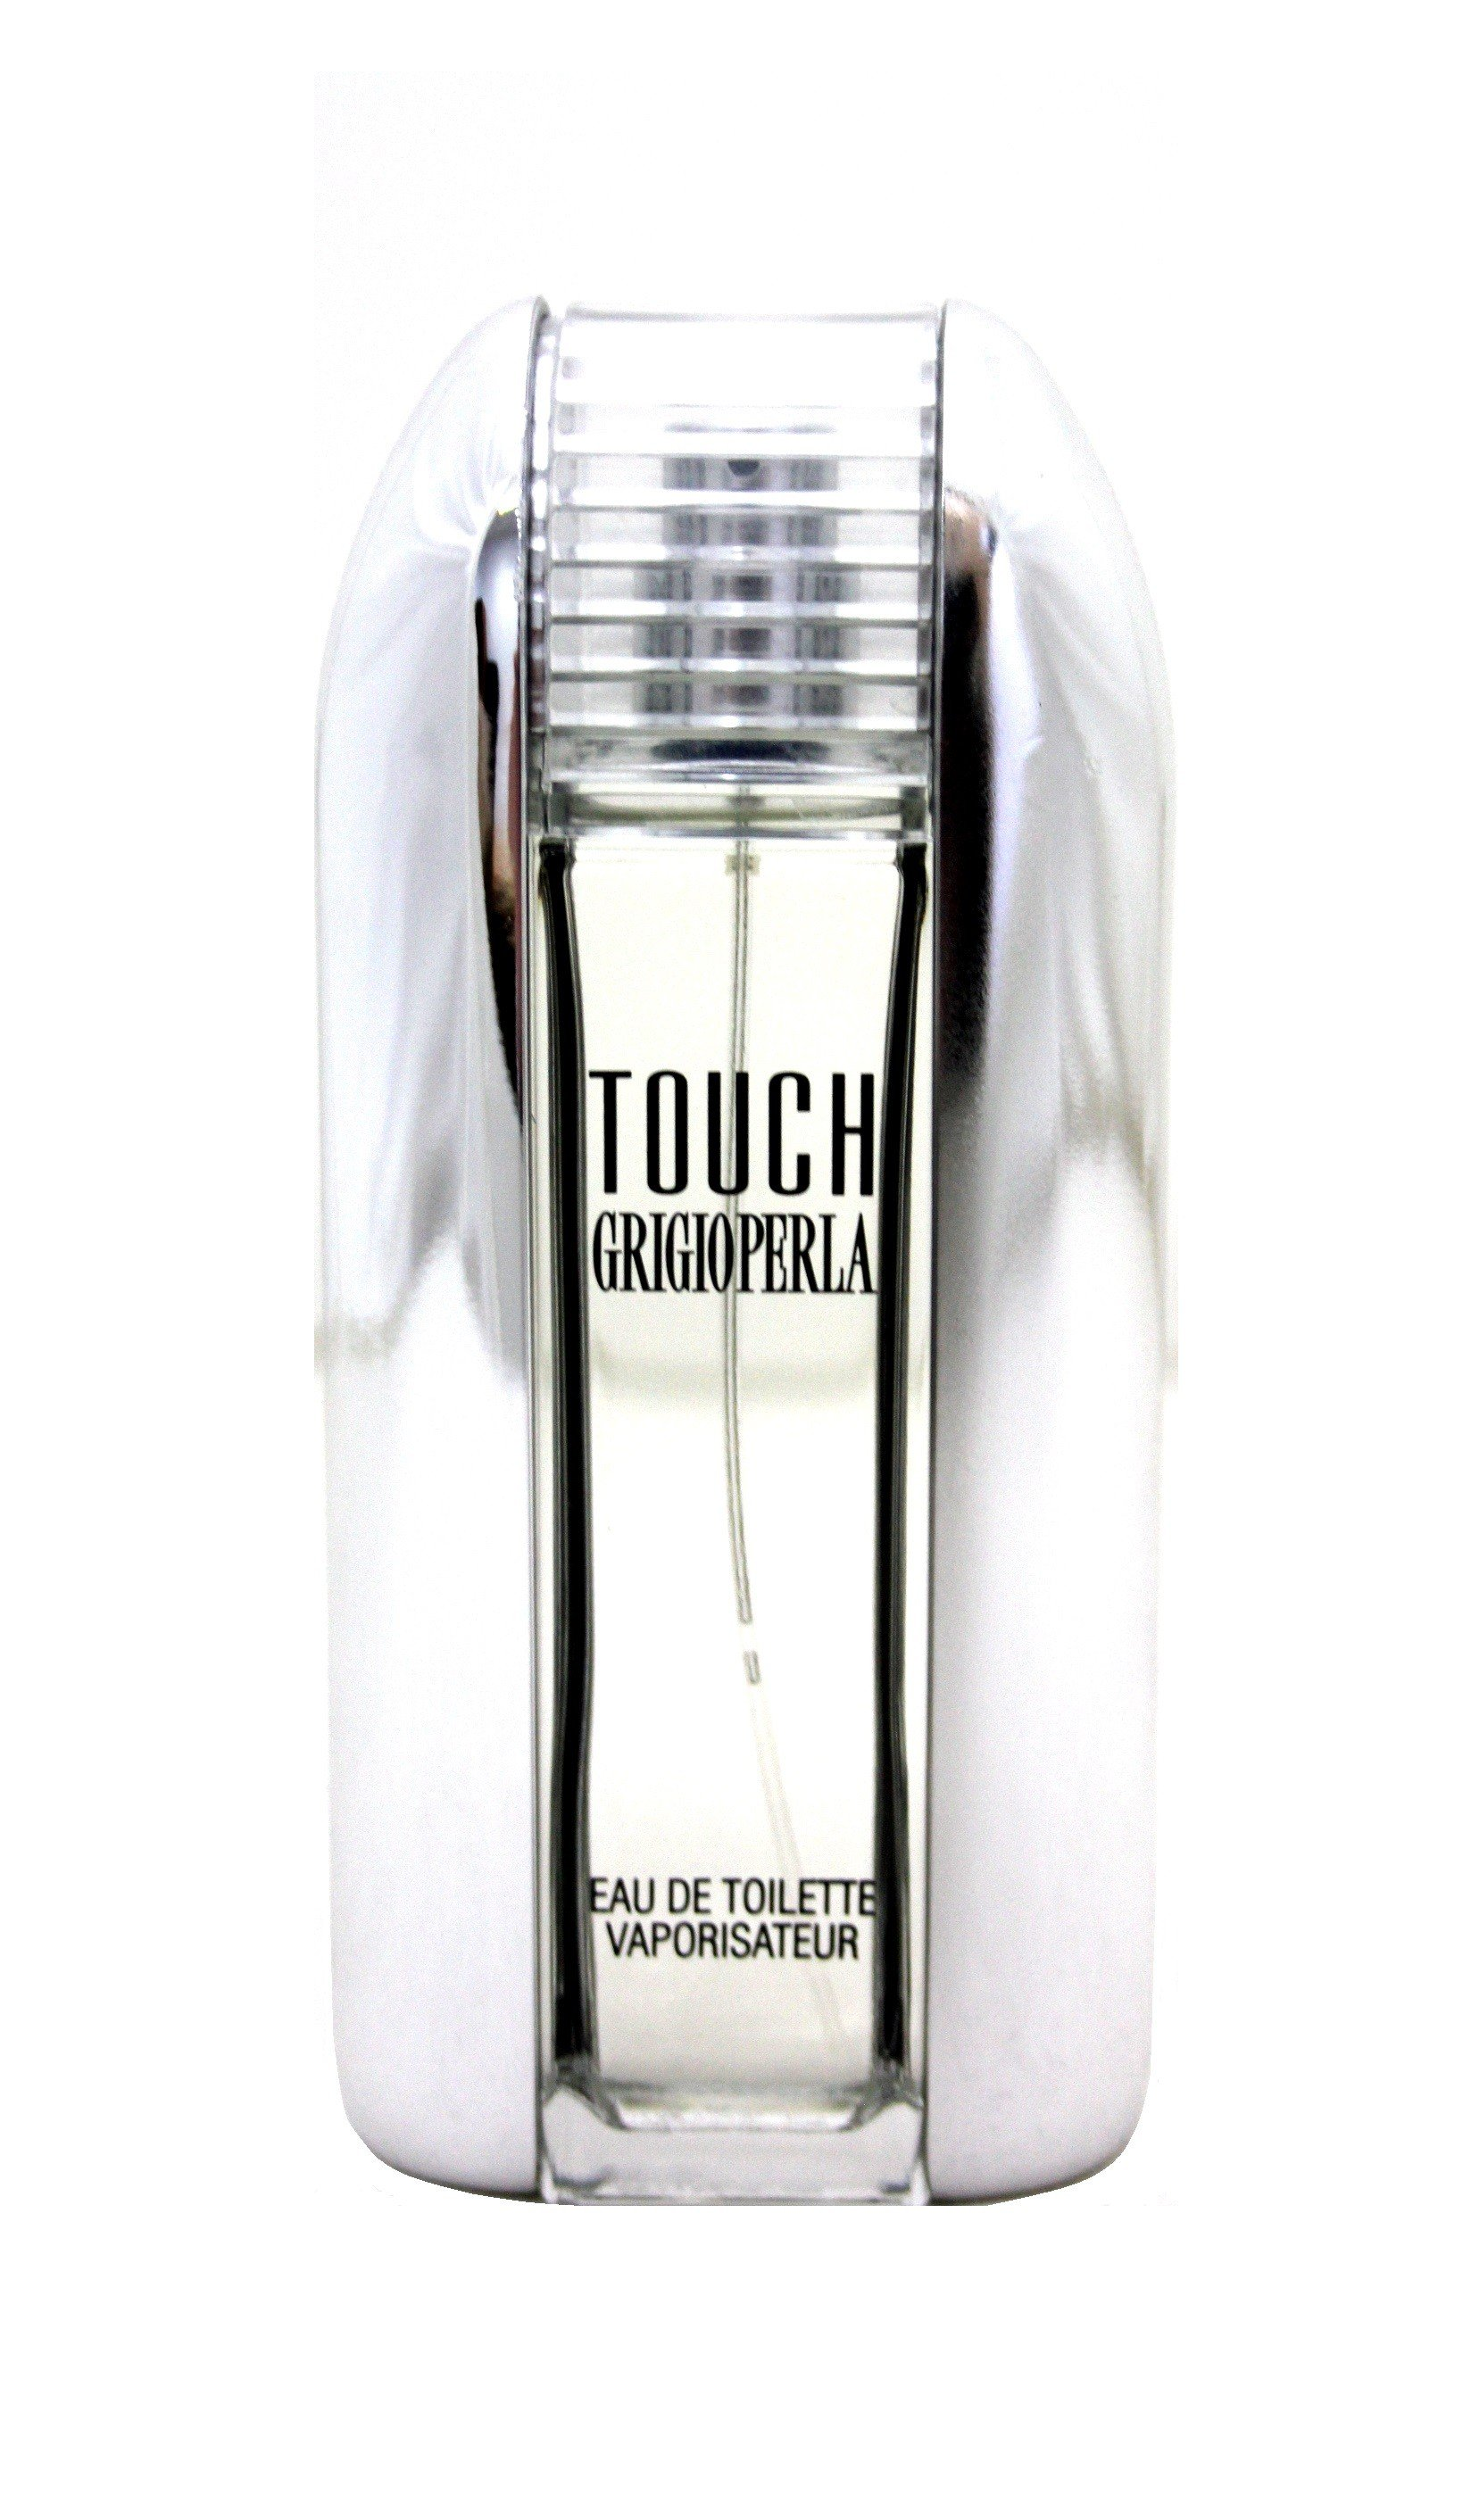 La Perla Touch Grigio Perla Eau de Toilette